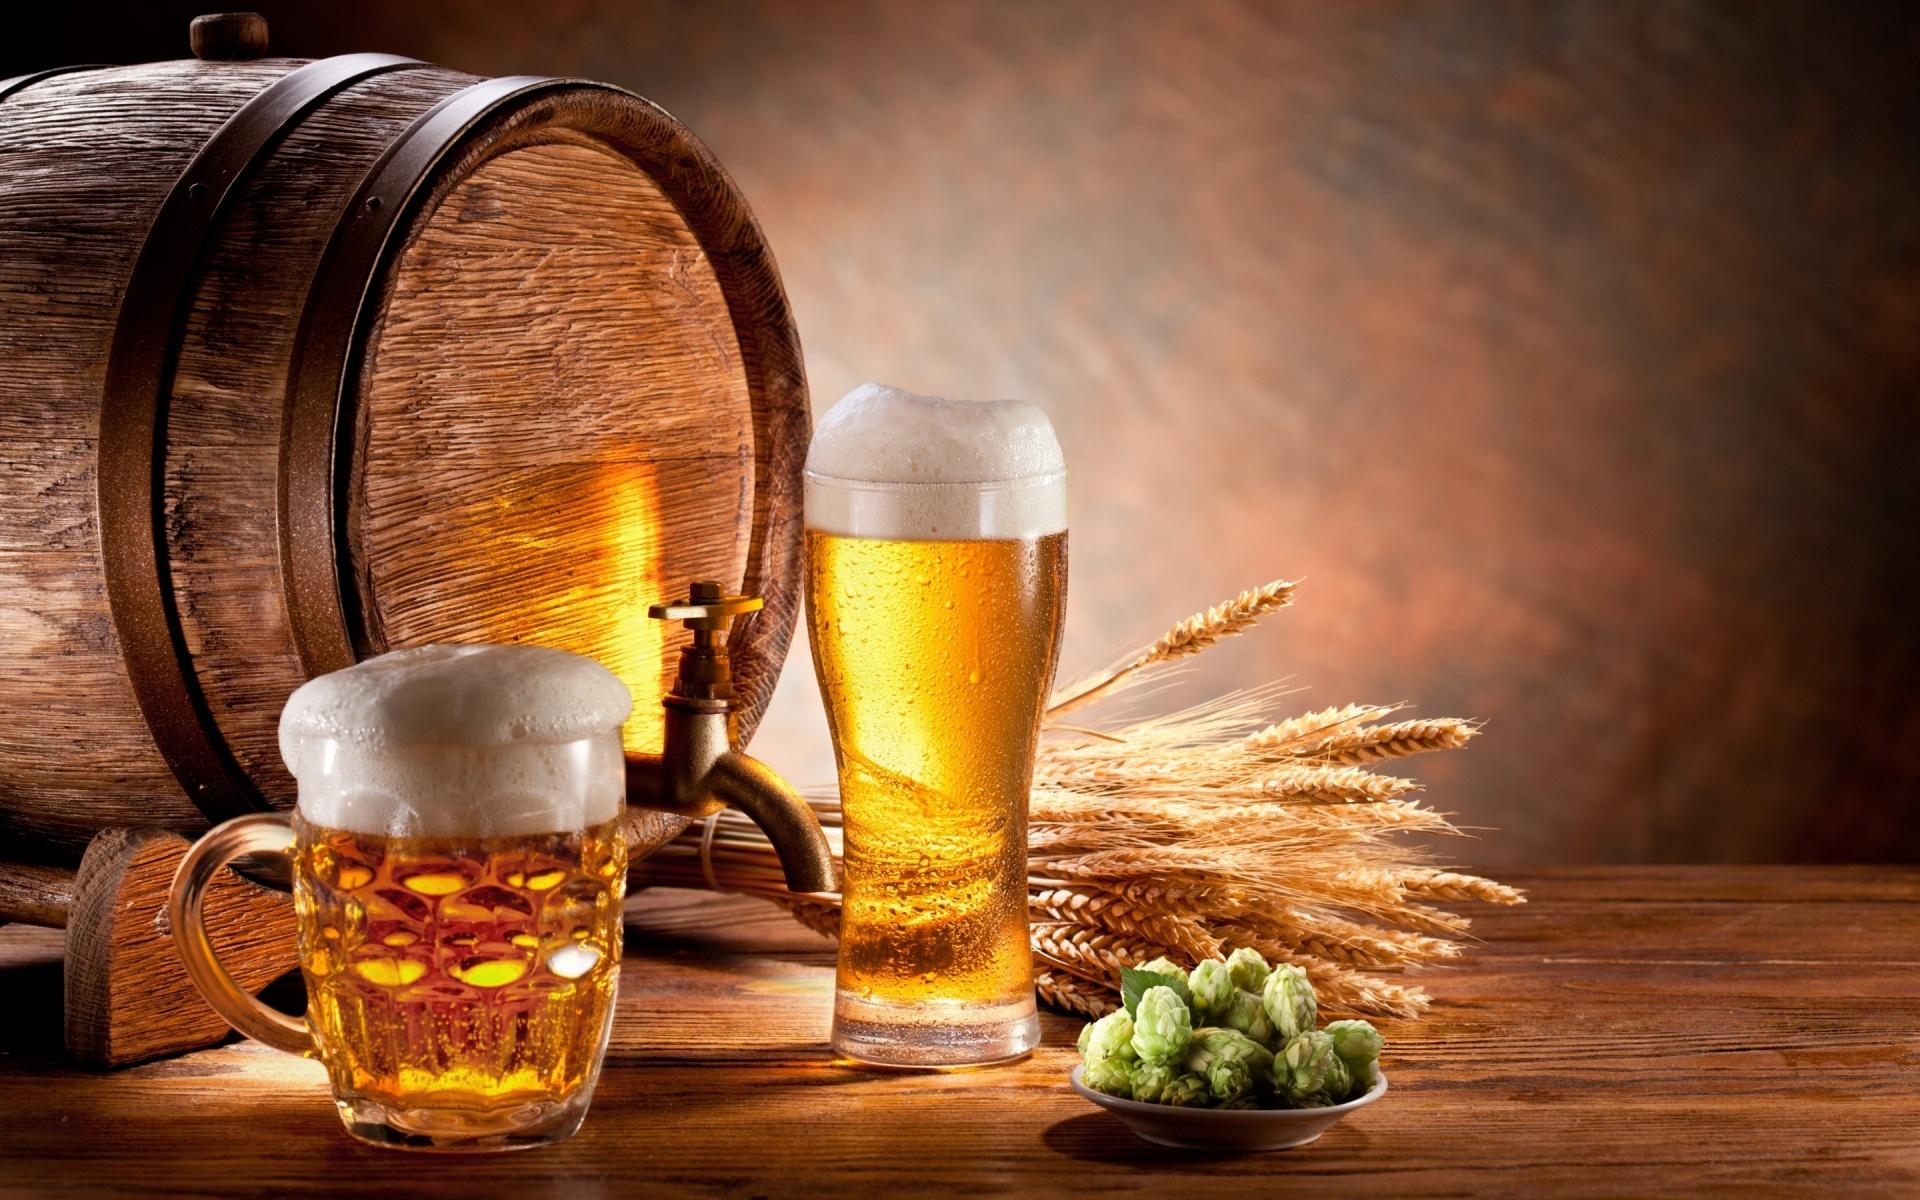 Draft Beer Glasses Hd Wallpaper